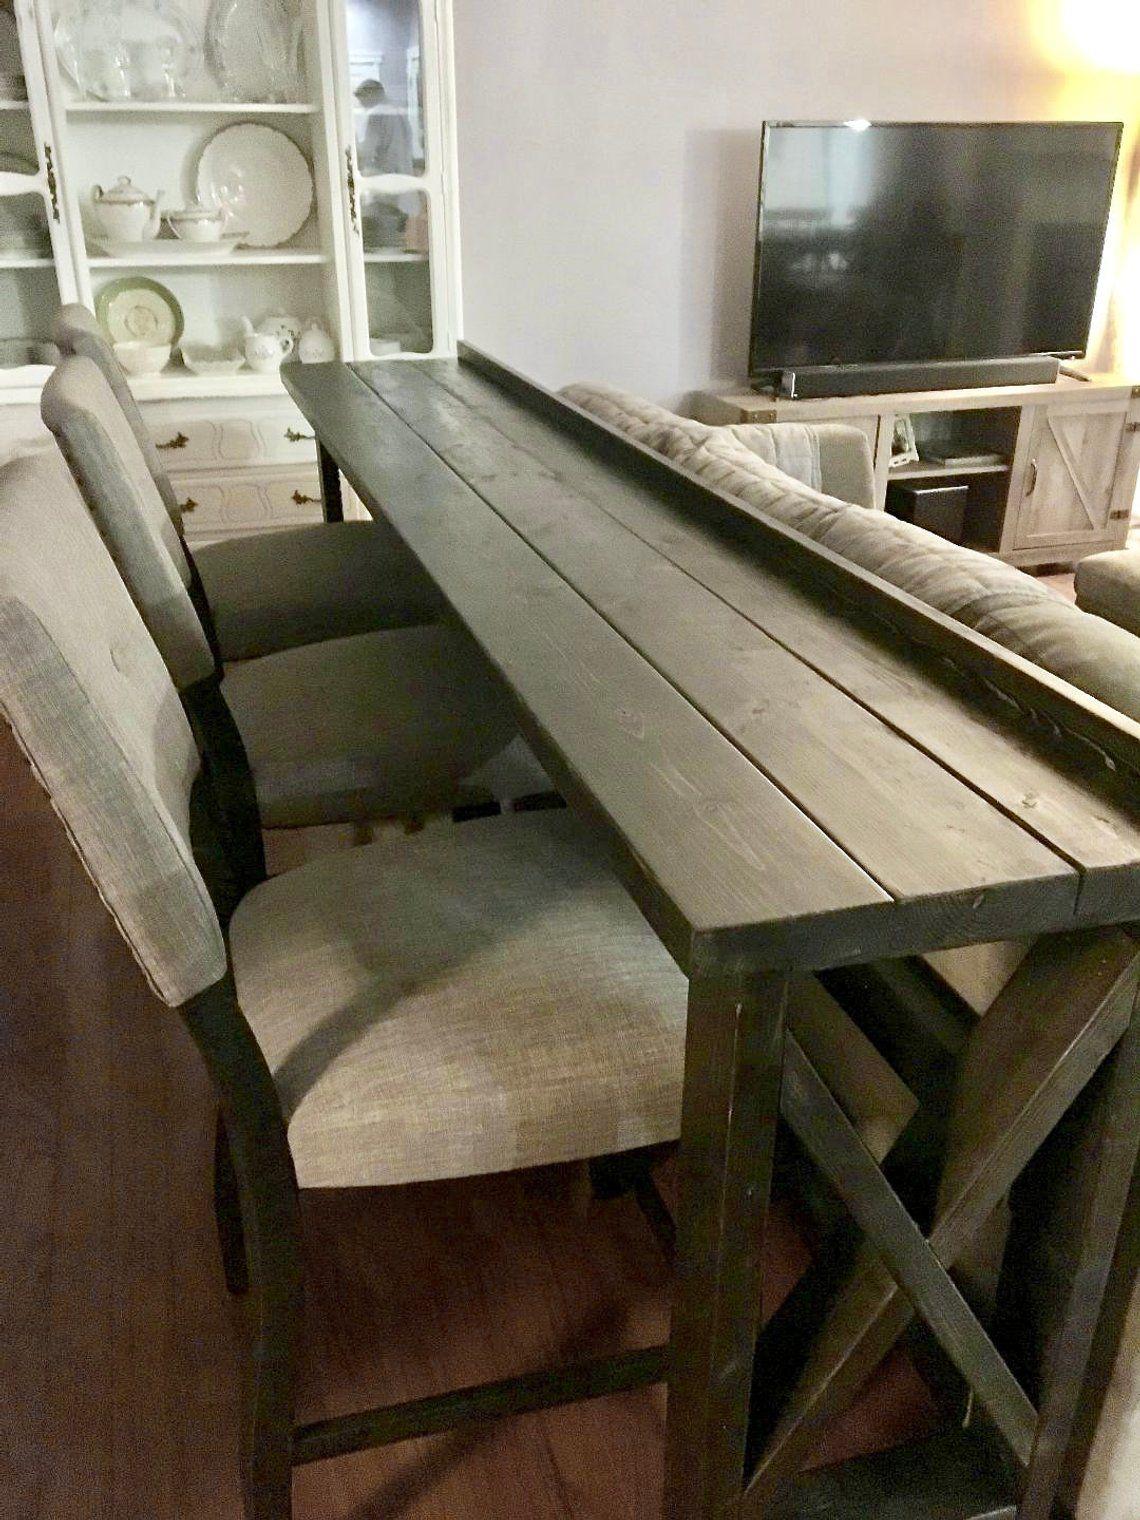 Sofa Back Bar Table Etsy Diy Sofa Table Diy Home Decor Projects Home